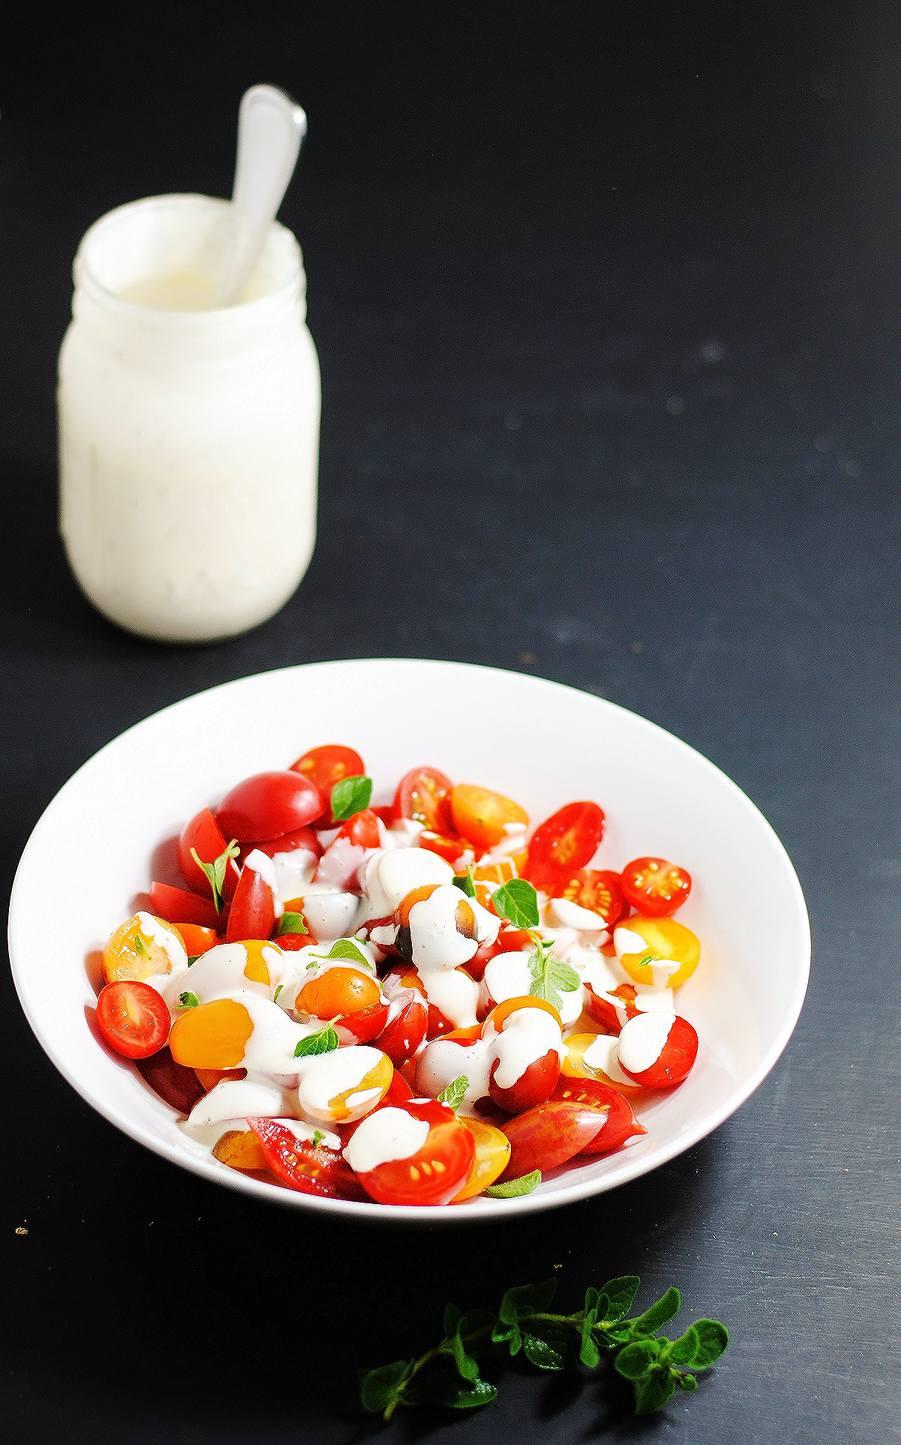 tomato salad with creamy garlic dressing